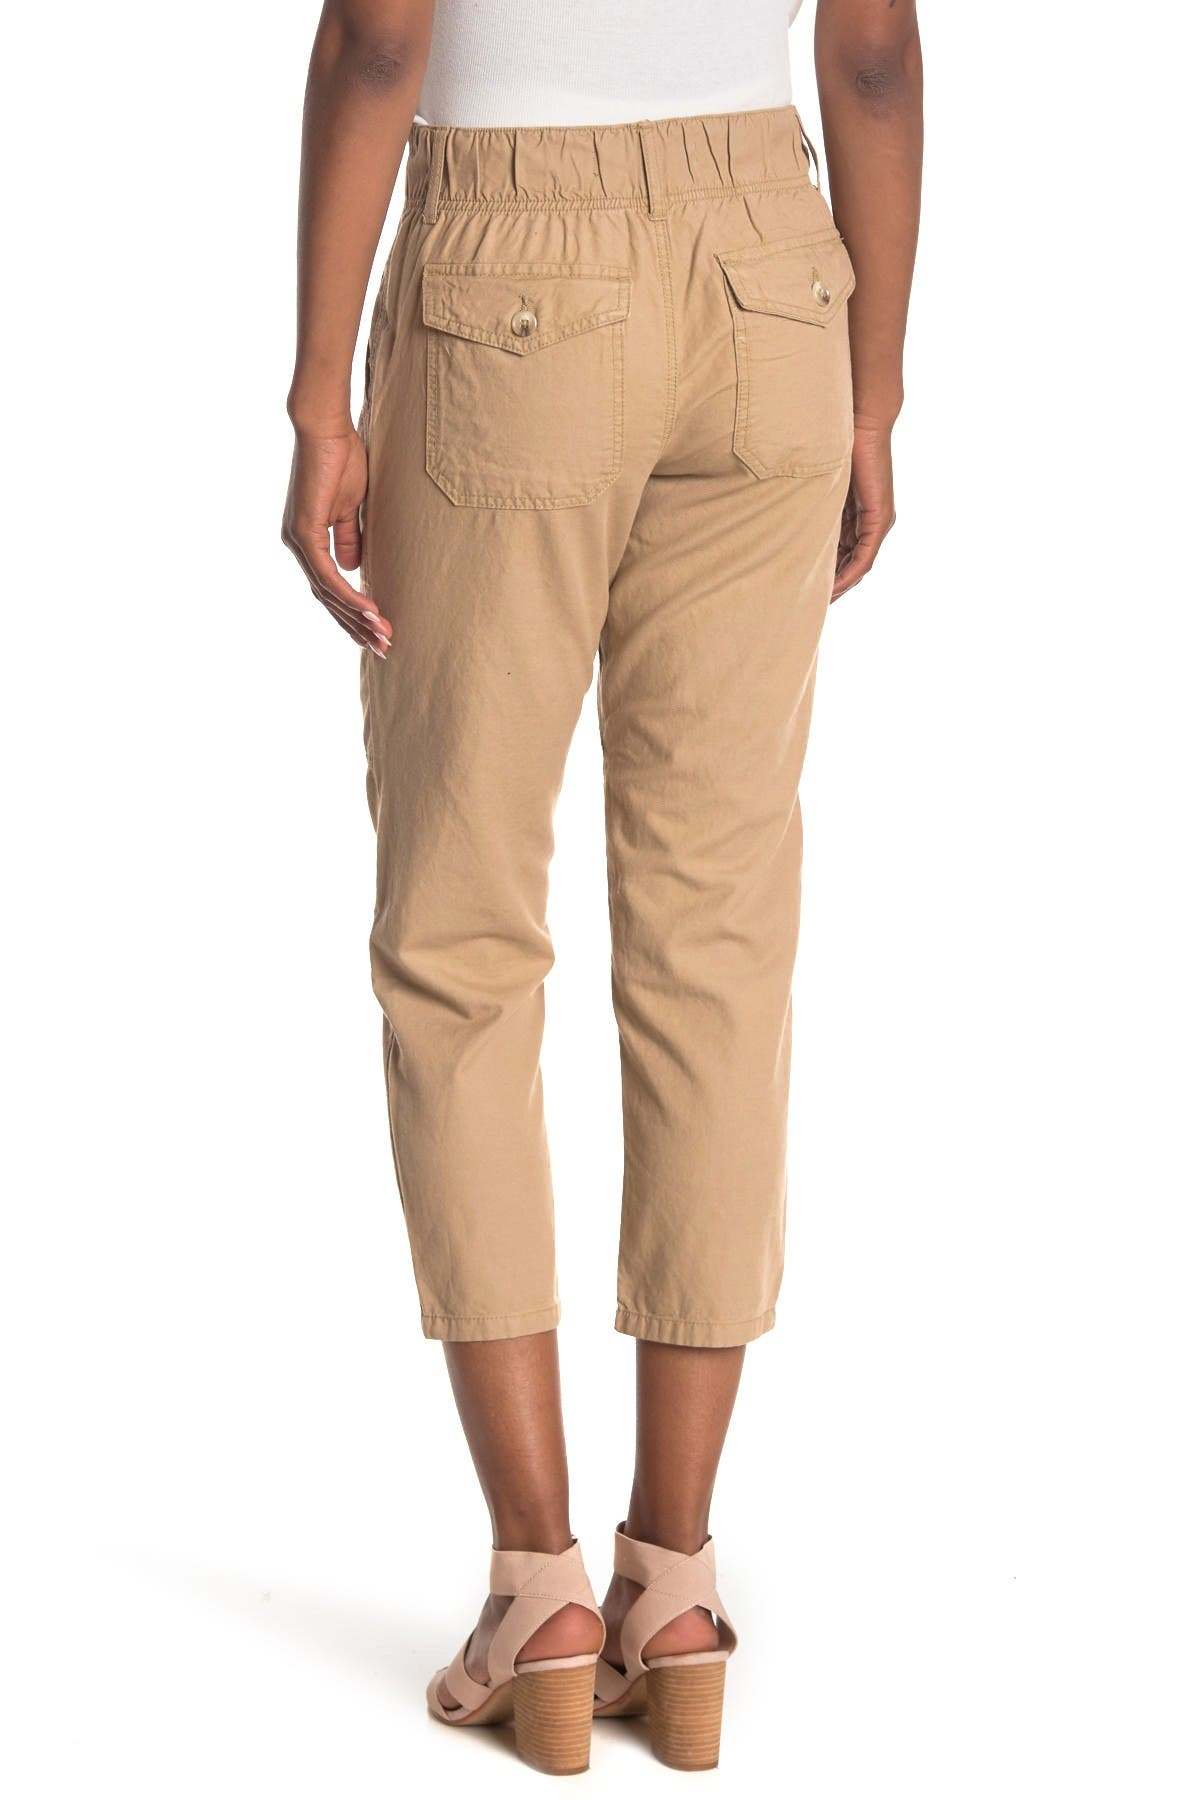 Image of C & C California Straight Leg Cargo Pants